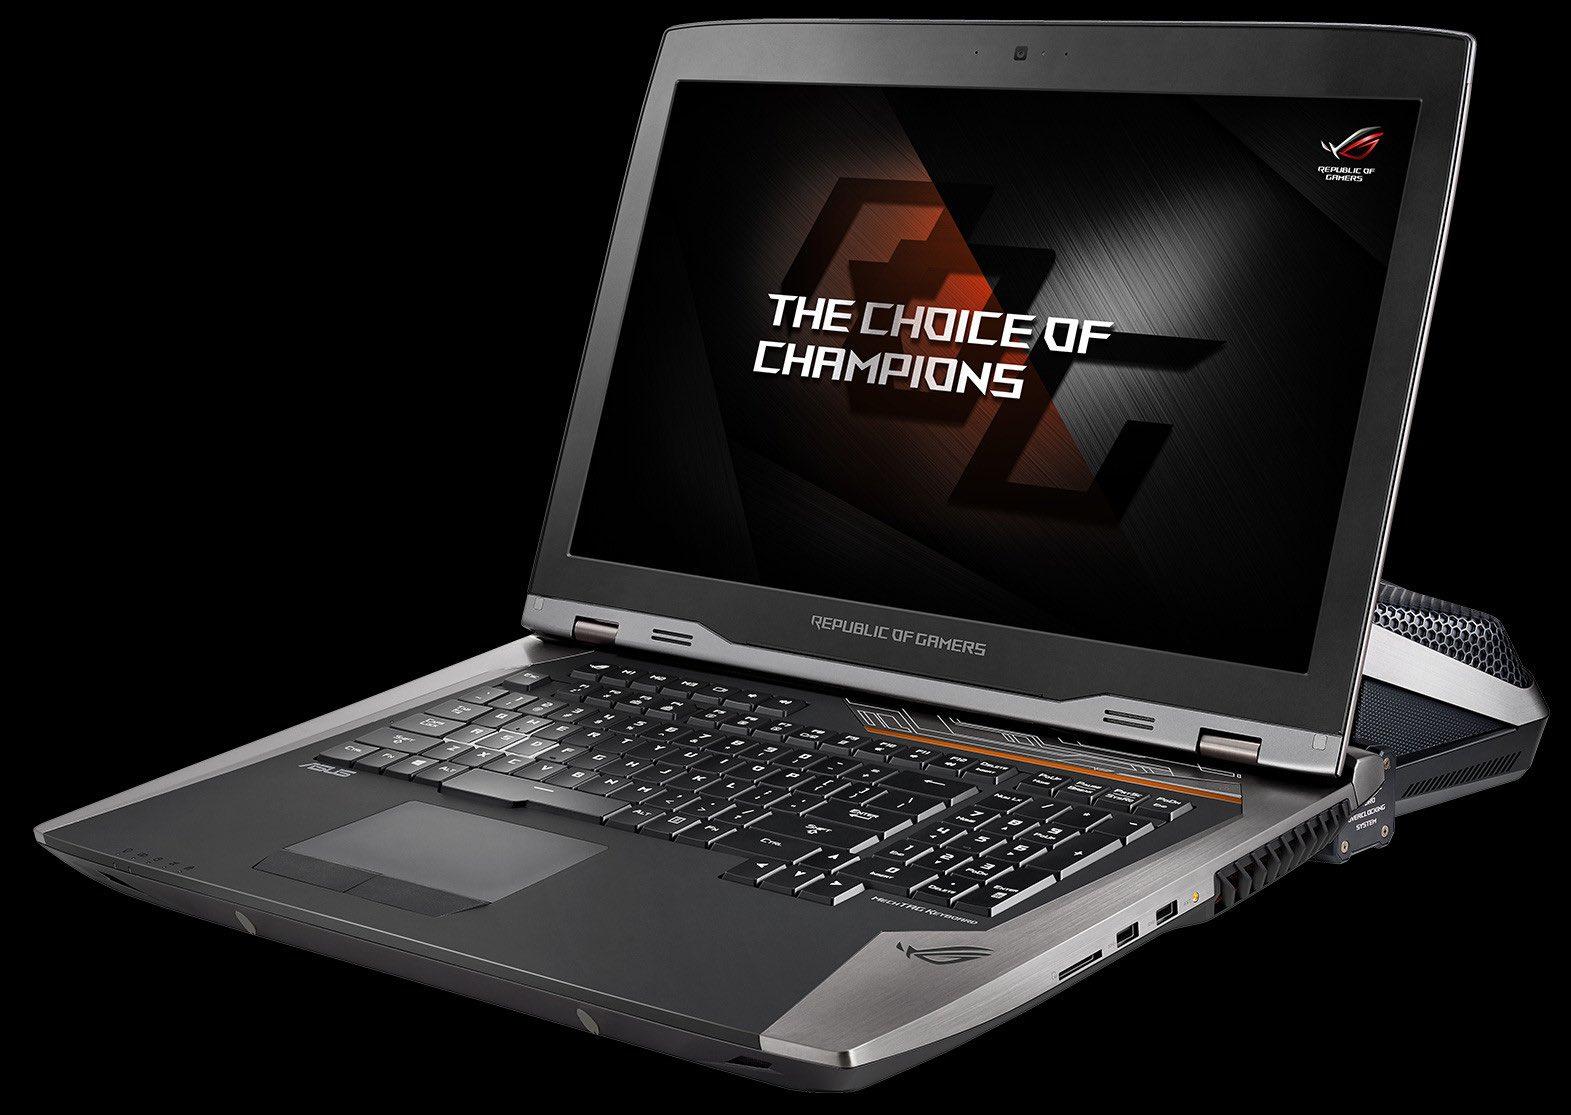 GX800 Asus